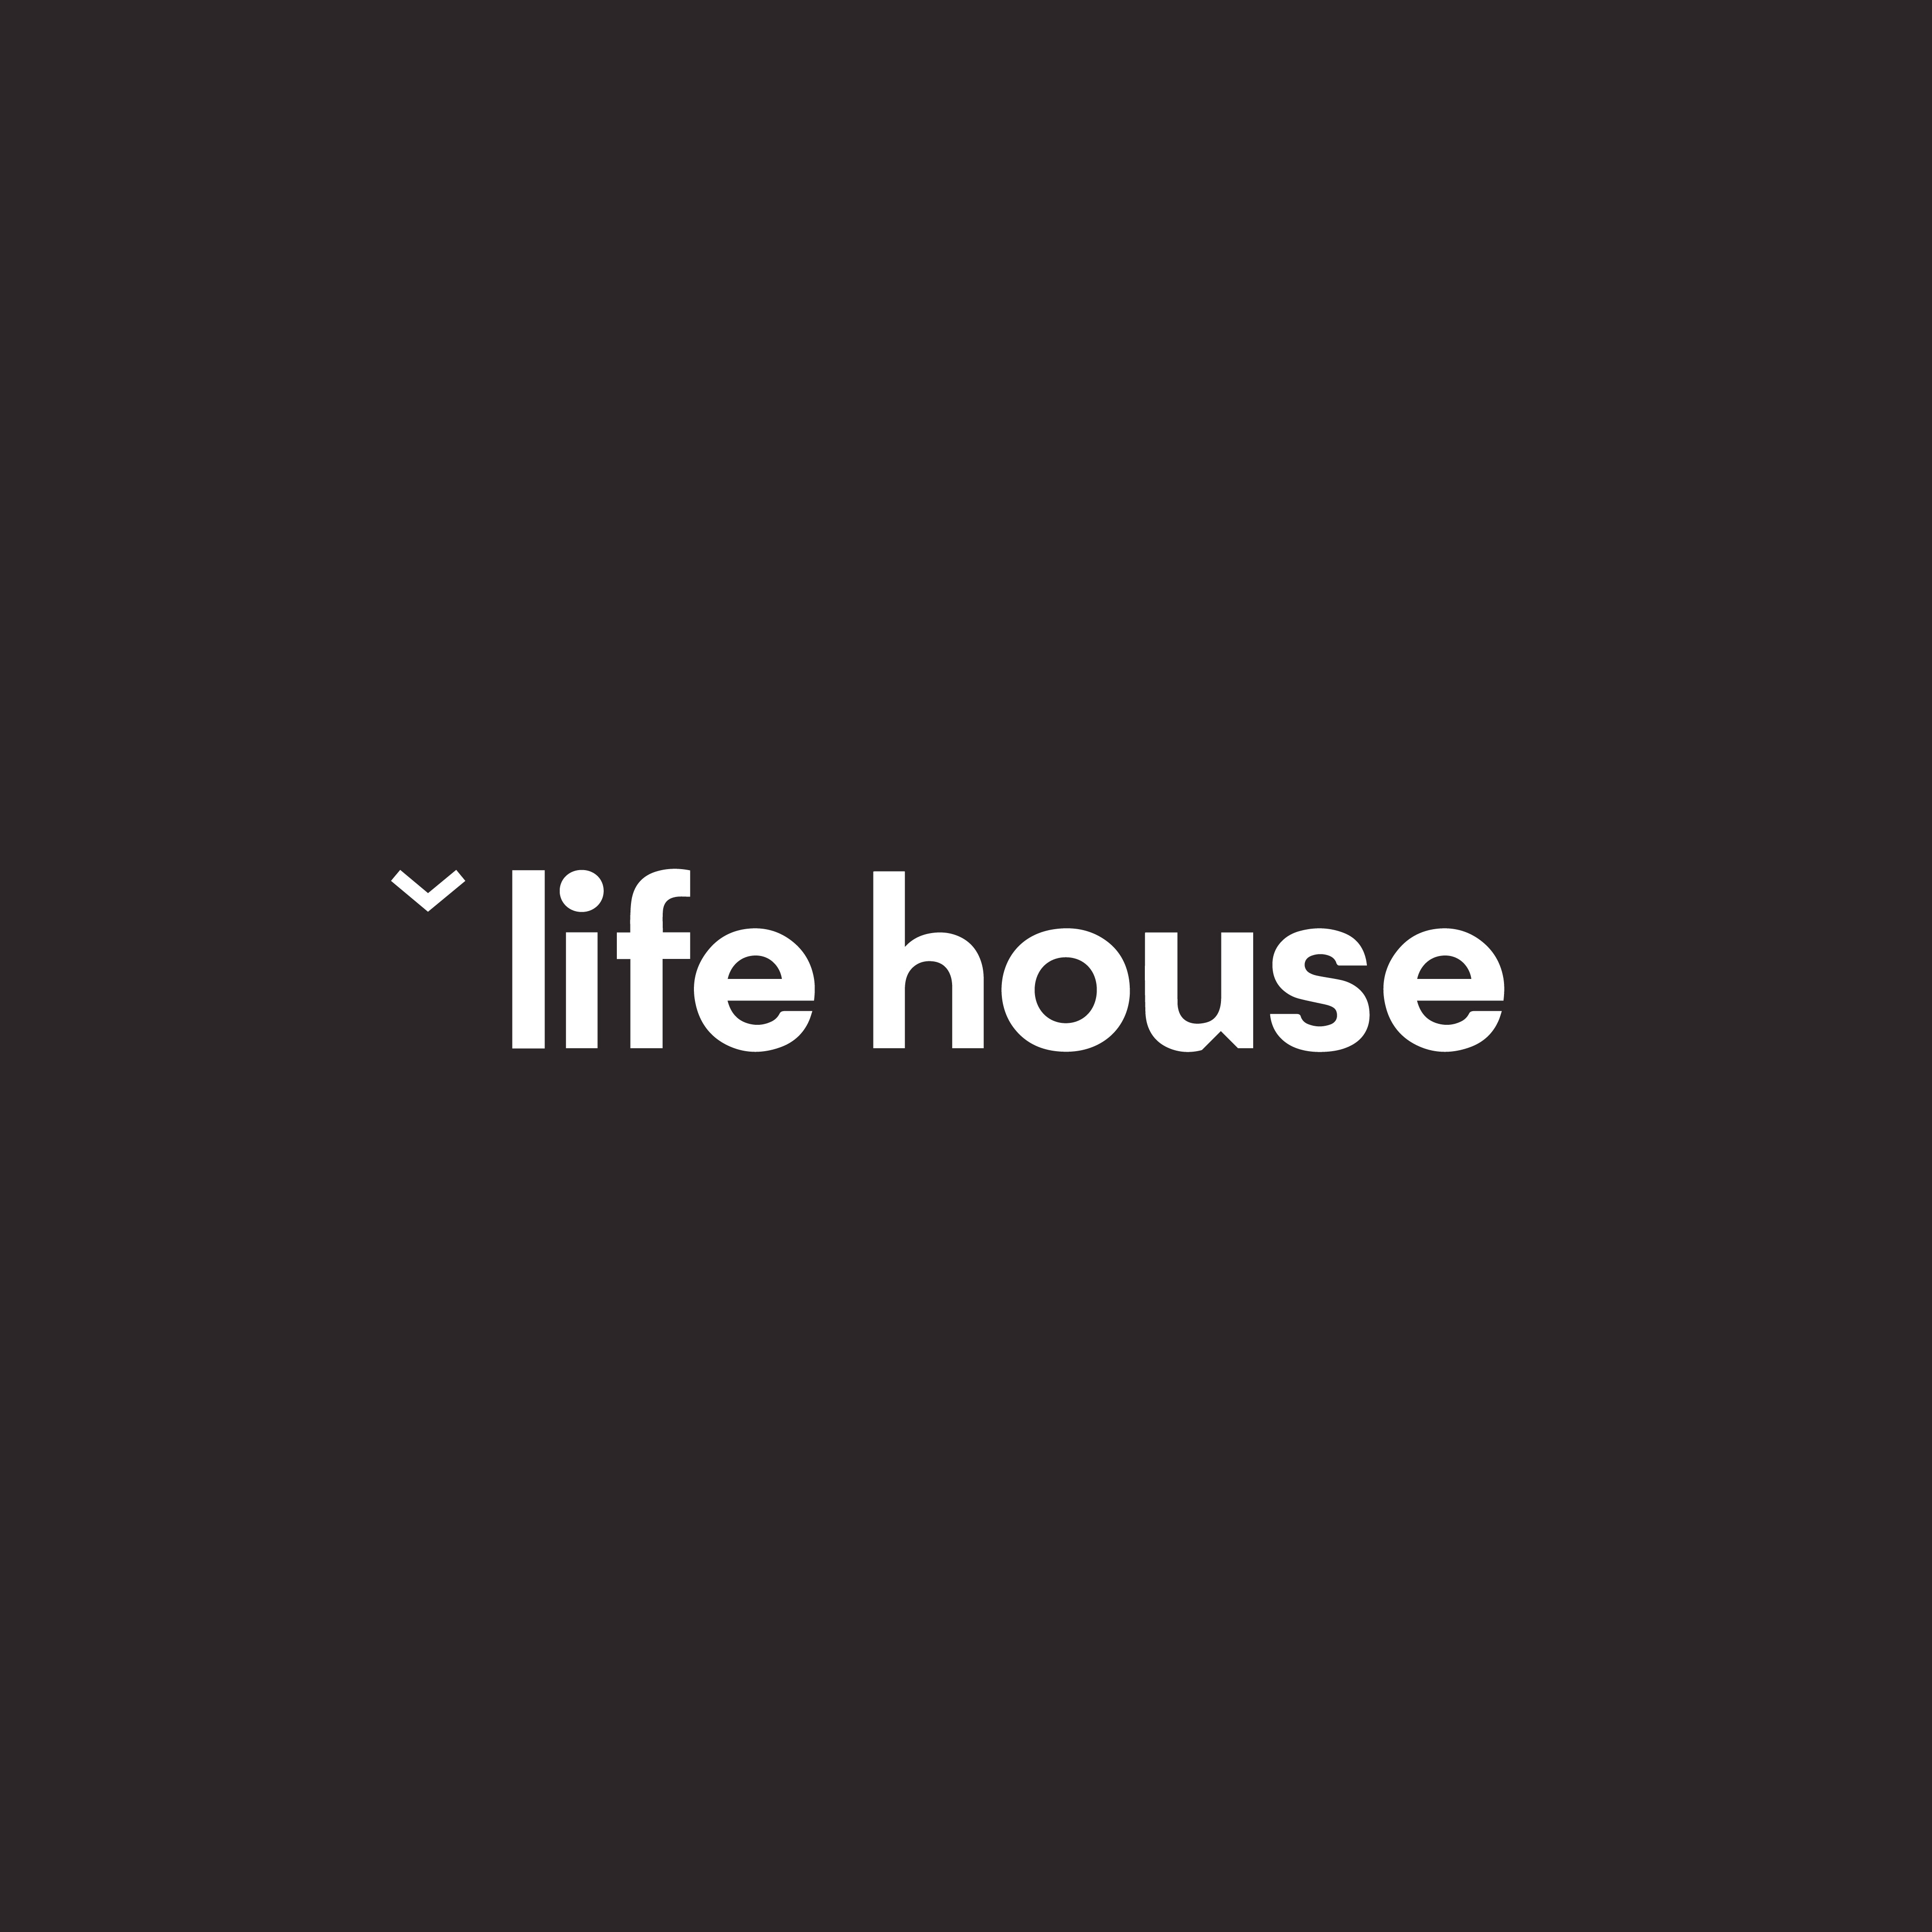 19.0304_LifeHouse-11